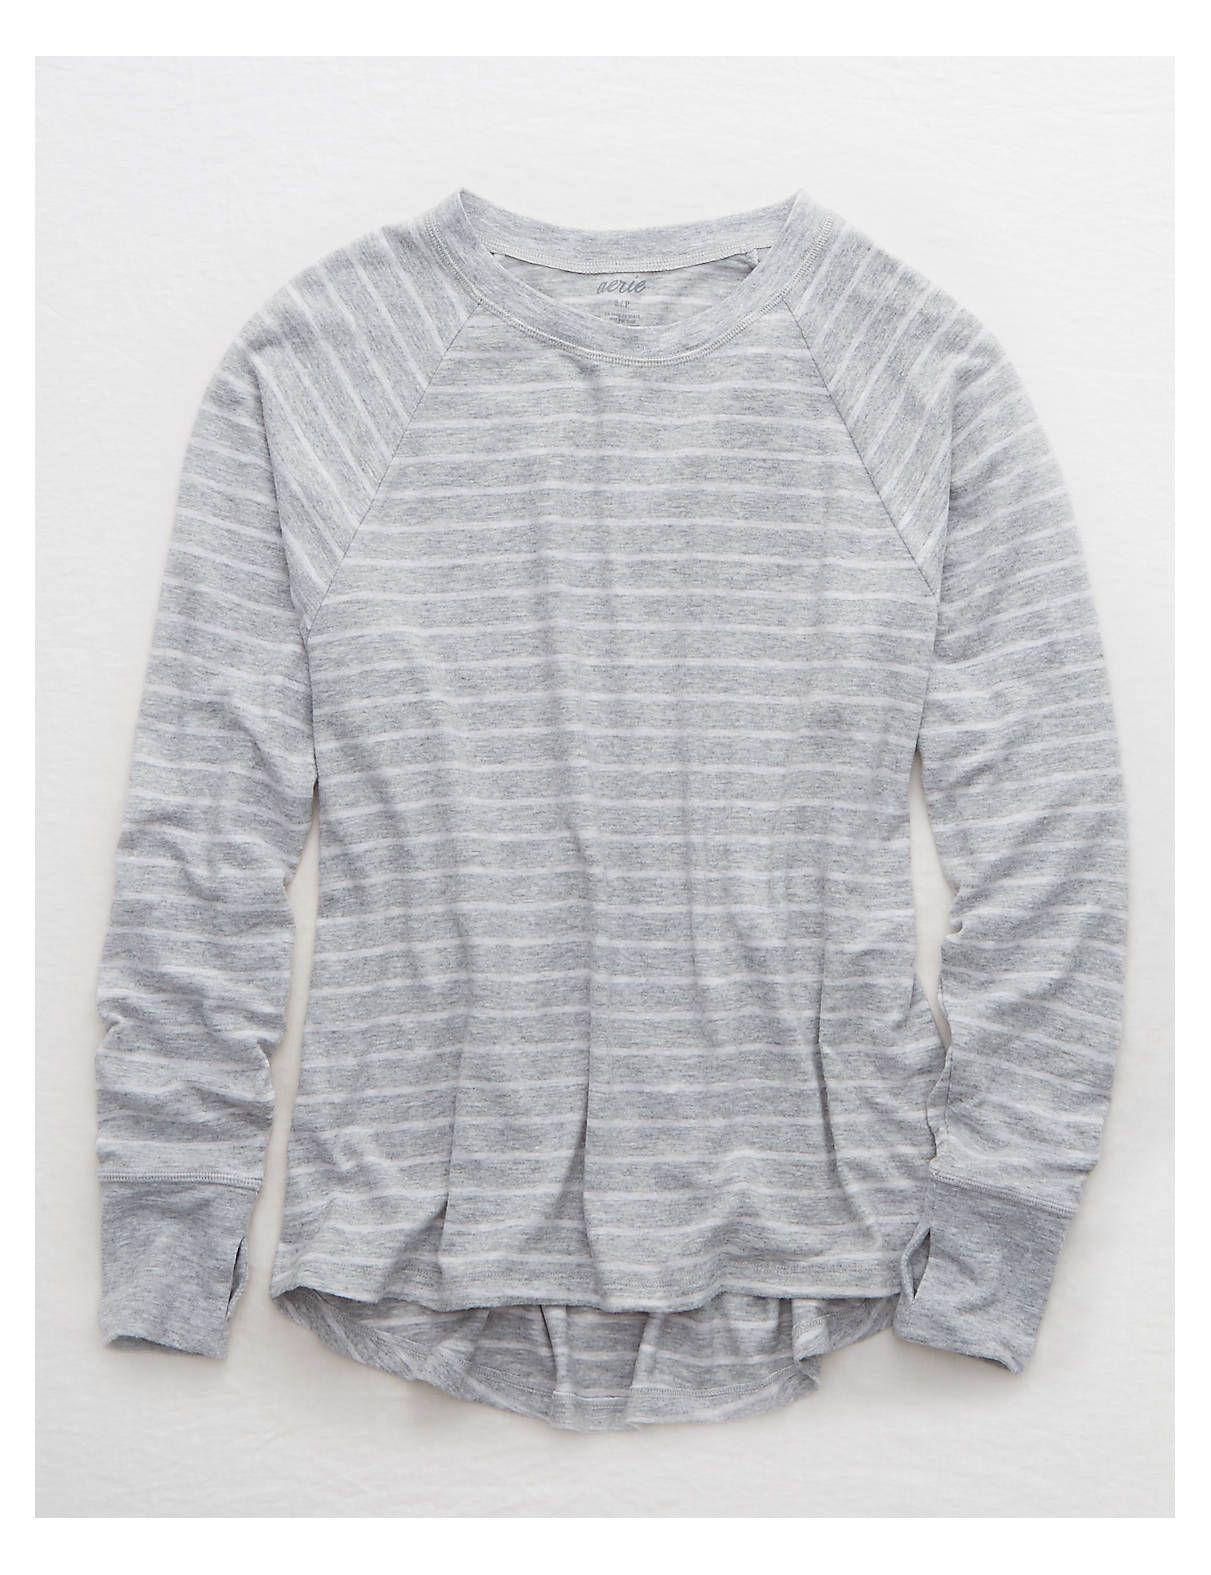 16dc5bd21deee2 Aerie Plush Pajama Tee, Medium Heather | American Eagle Outfitters ...